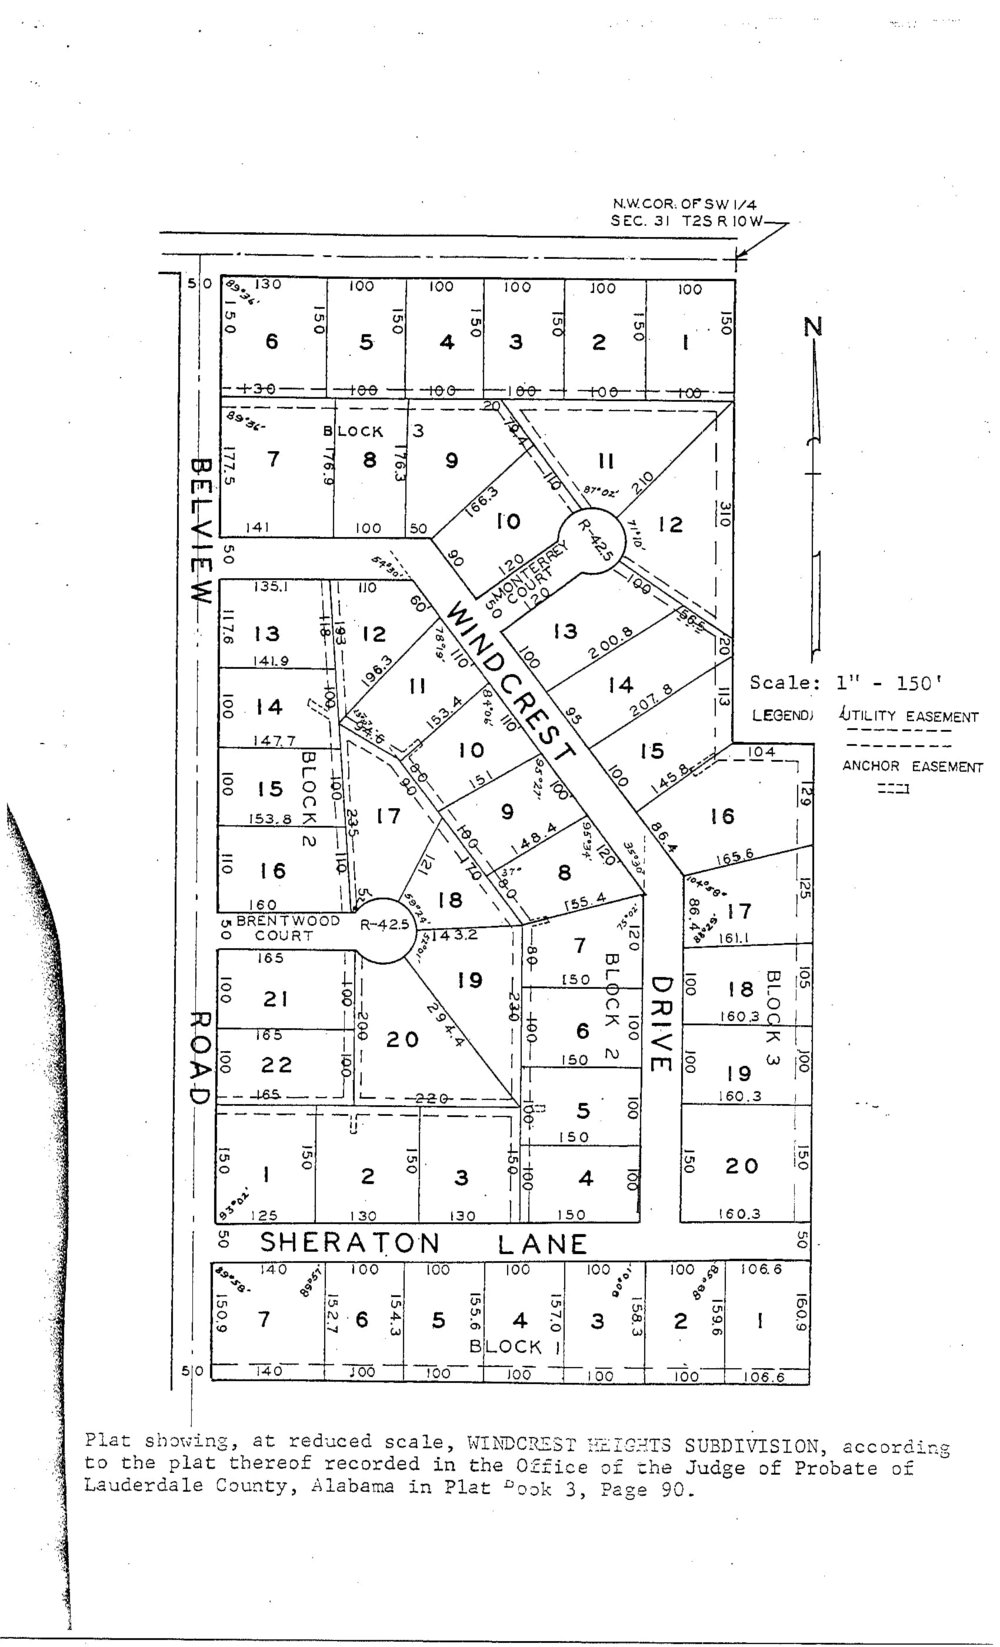 Plat-Windcrest-Heights-Subdivision-1.jpg